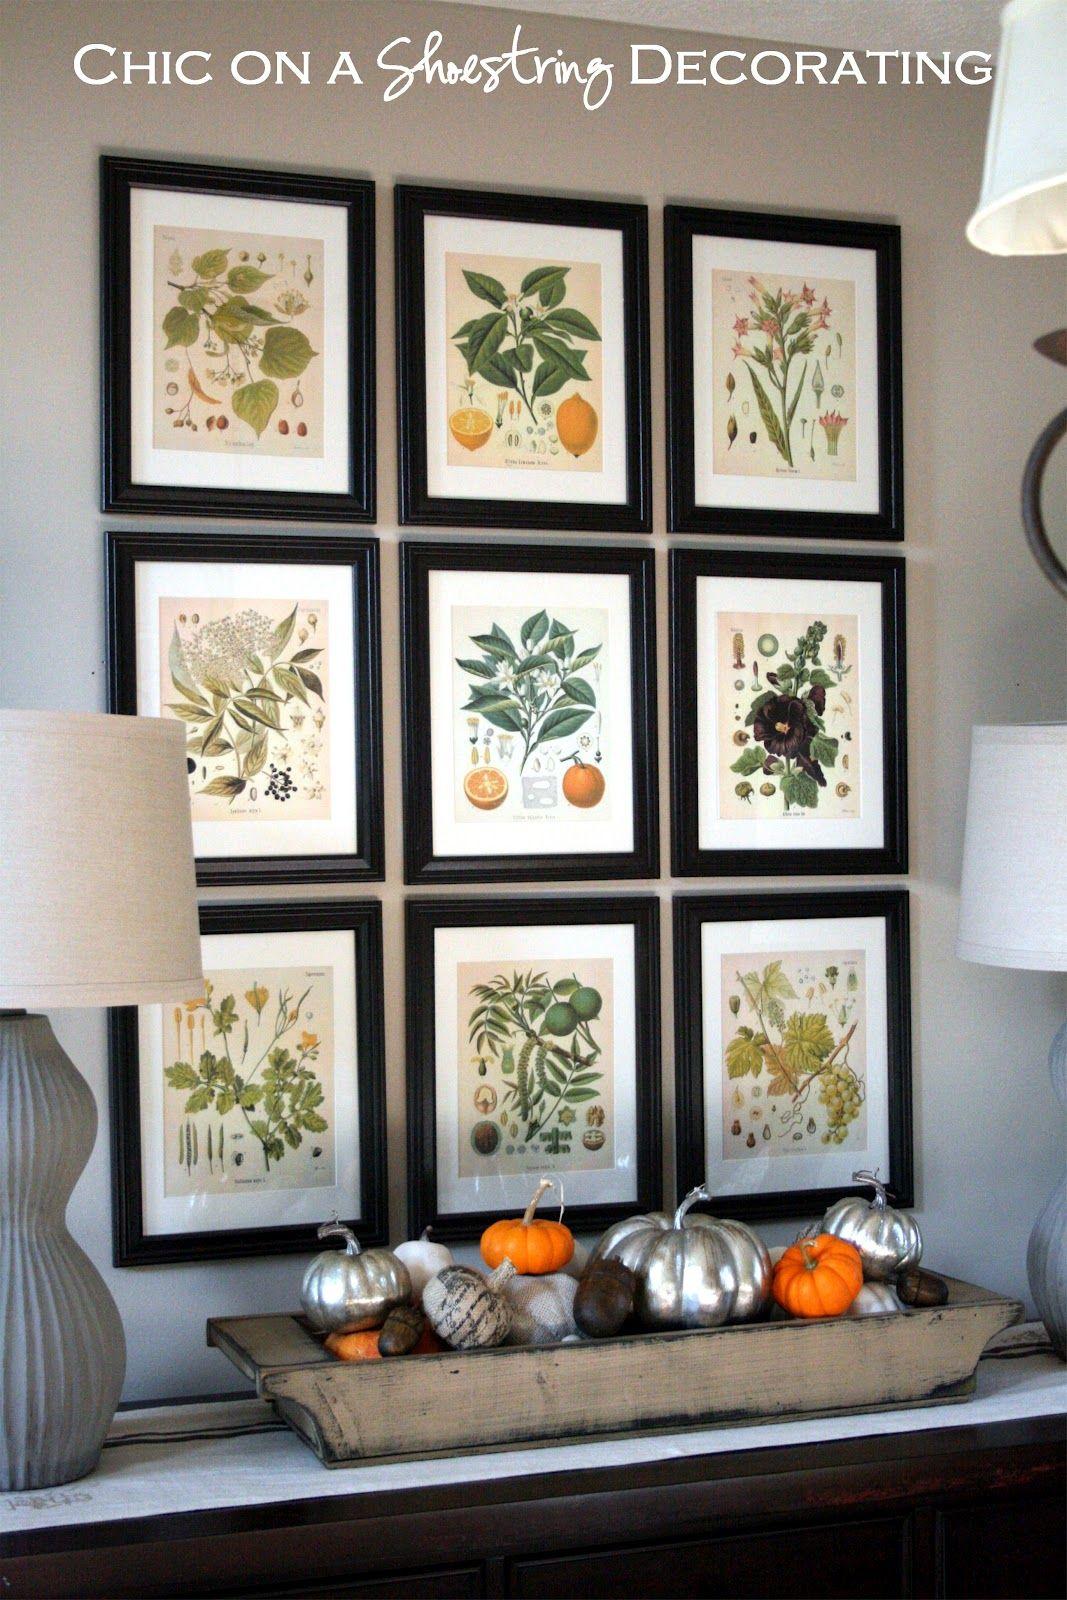 free+botanicals+5.JPG 1,067×1,600 pixels | House | Pinterest | Walls ...